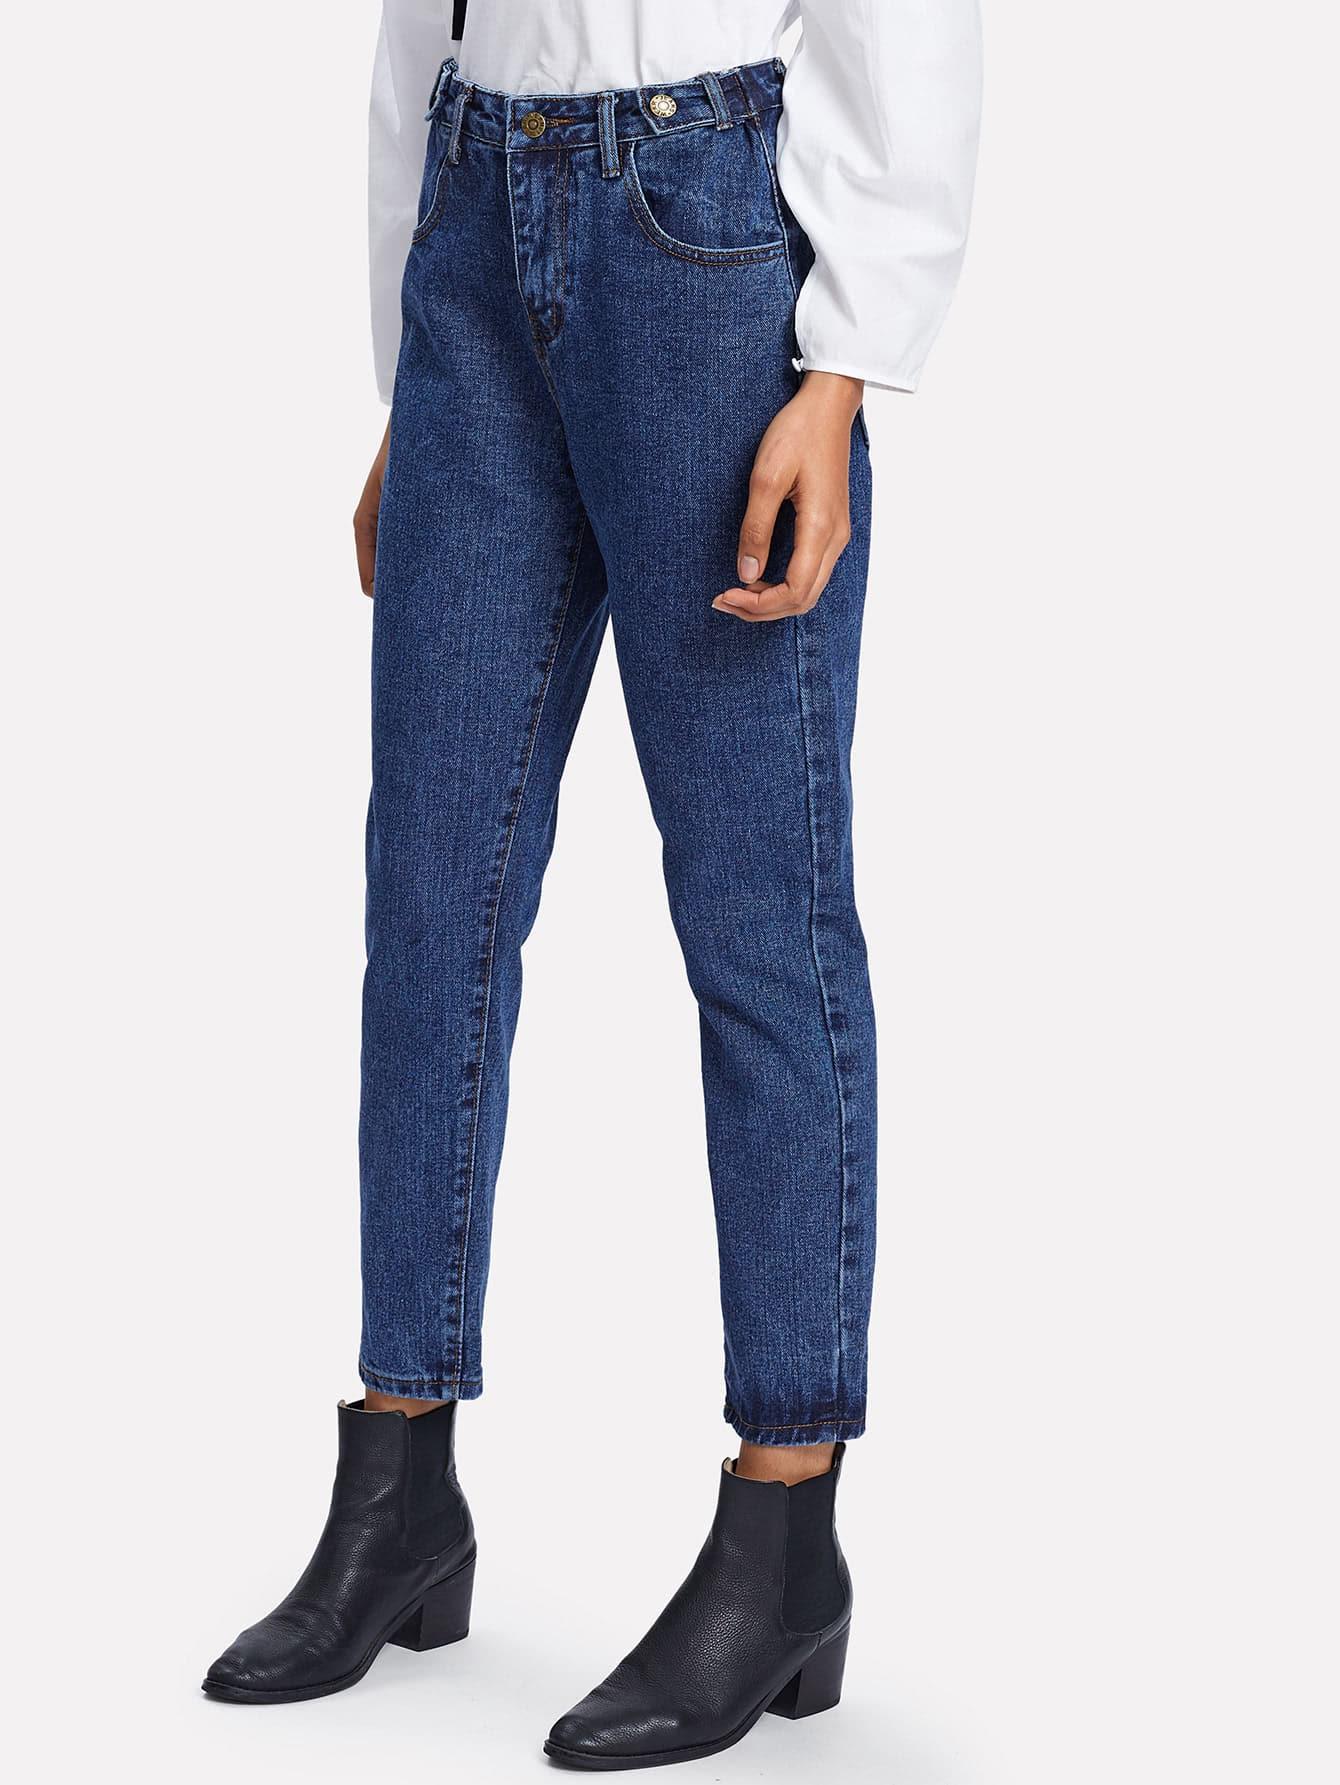 Carrot Crop Jeans grid carrot pants